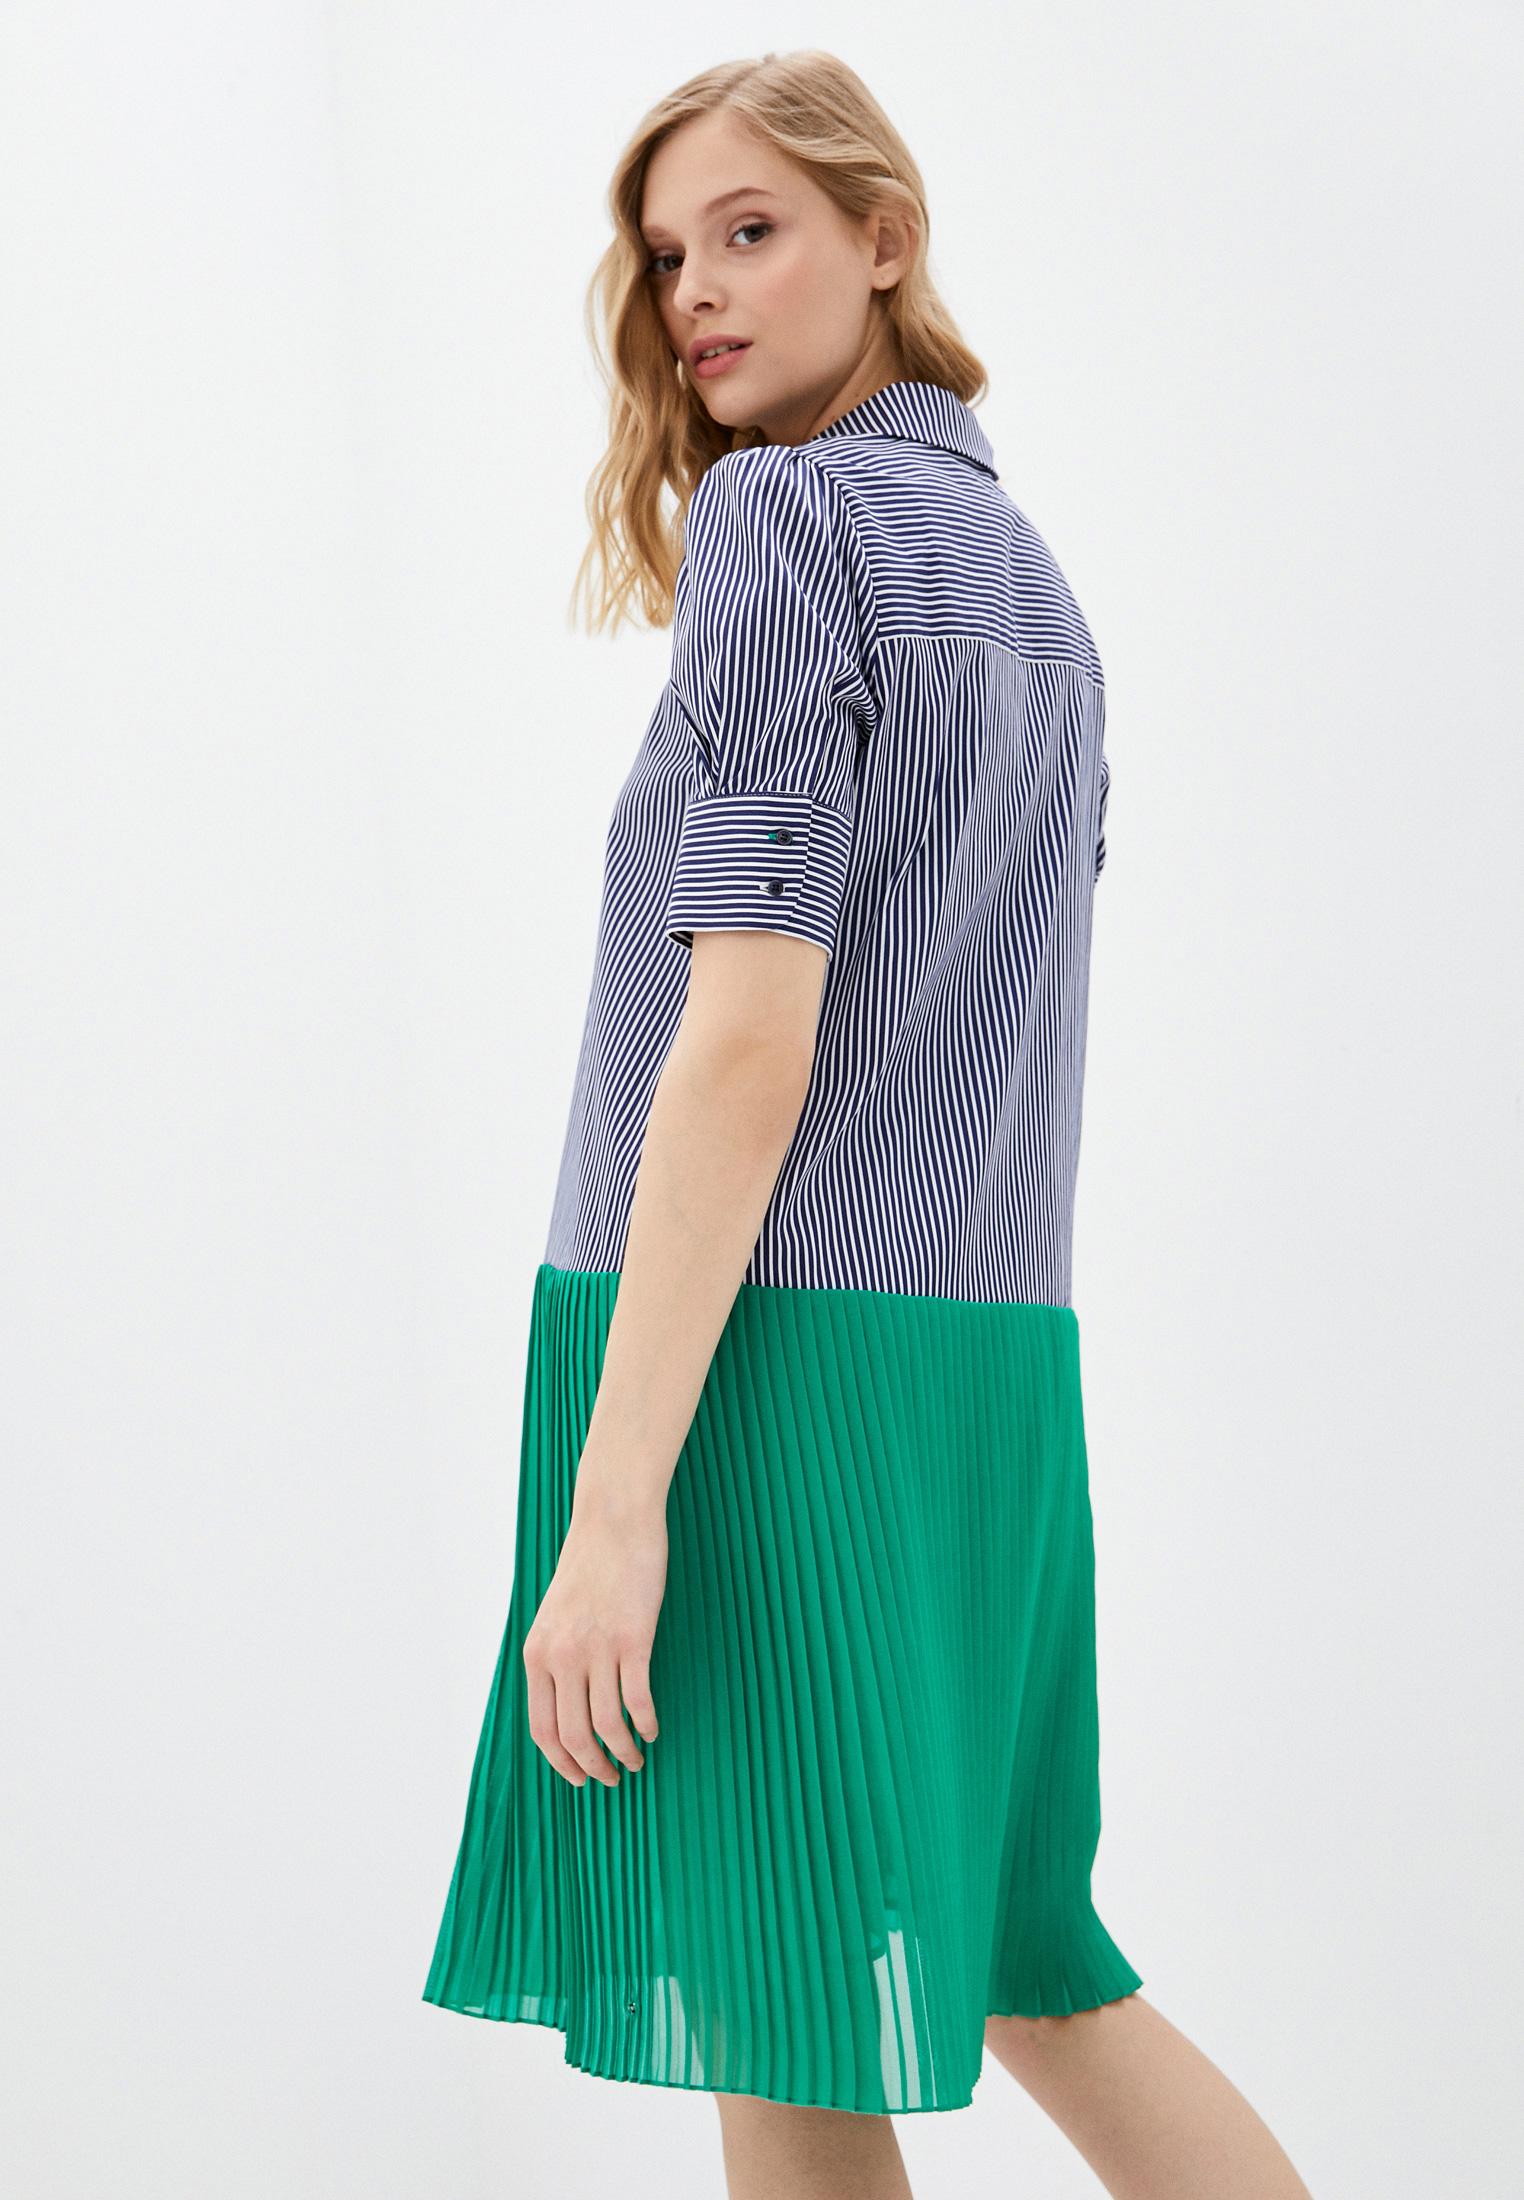 Платье Tommy Hilfiger (Томми Хилфигер) WW0WW30694: изображение 3